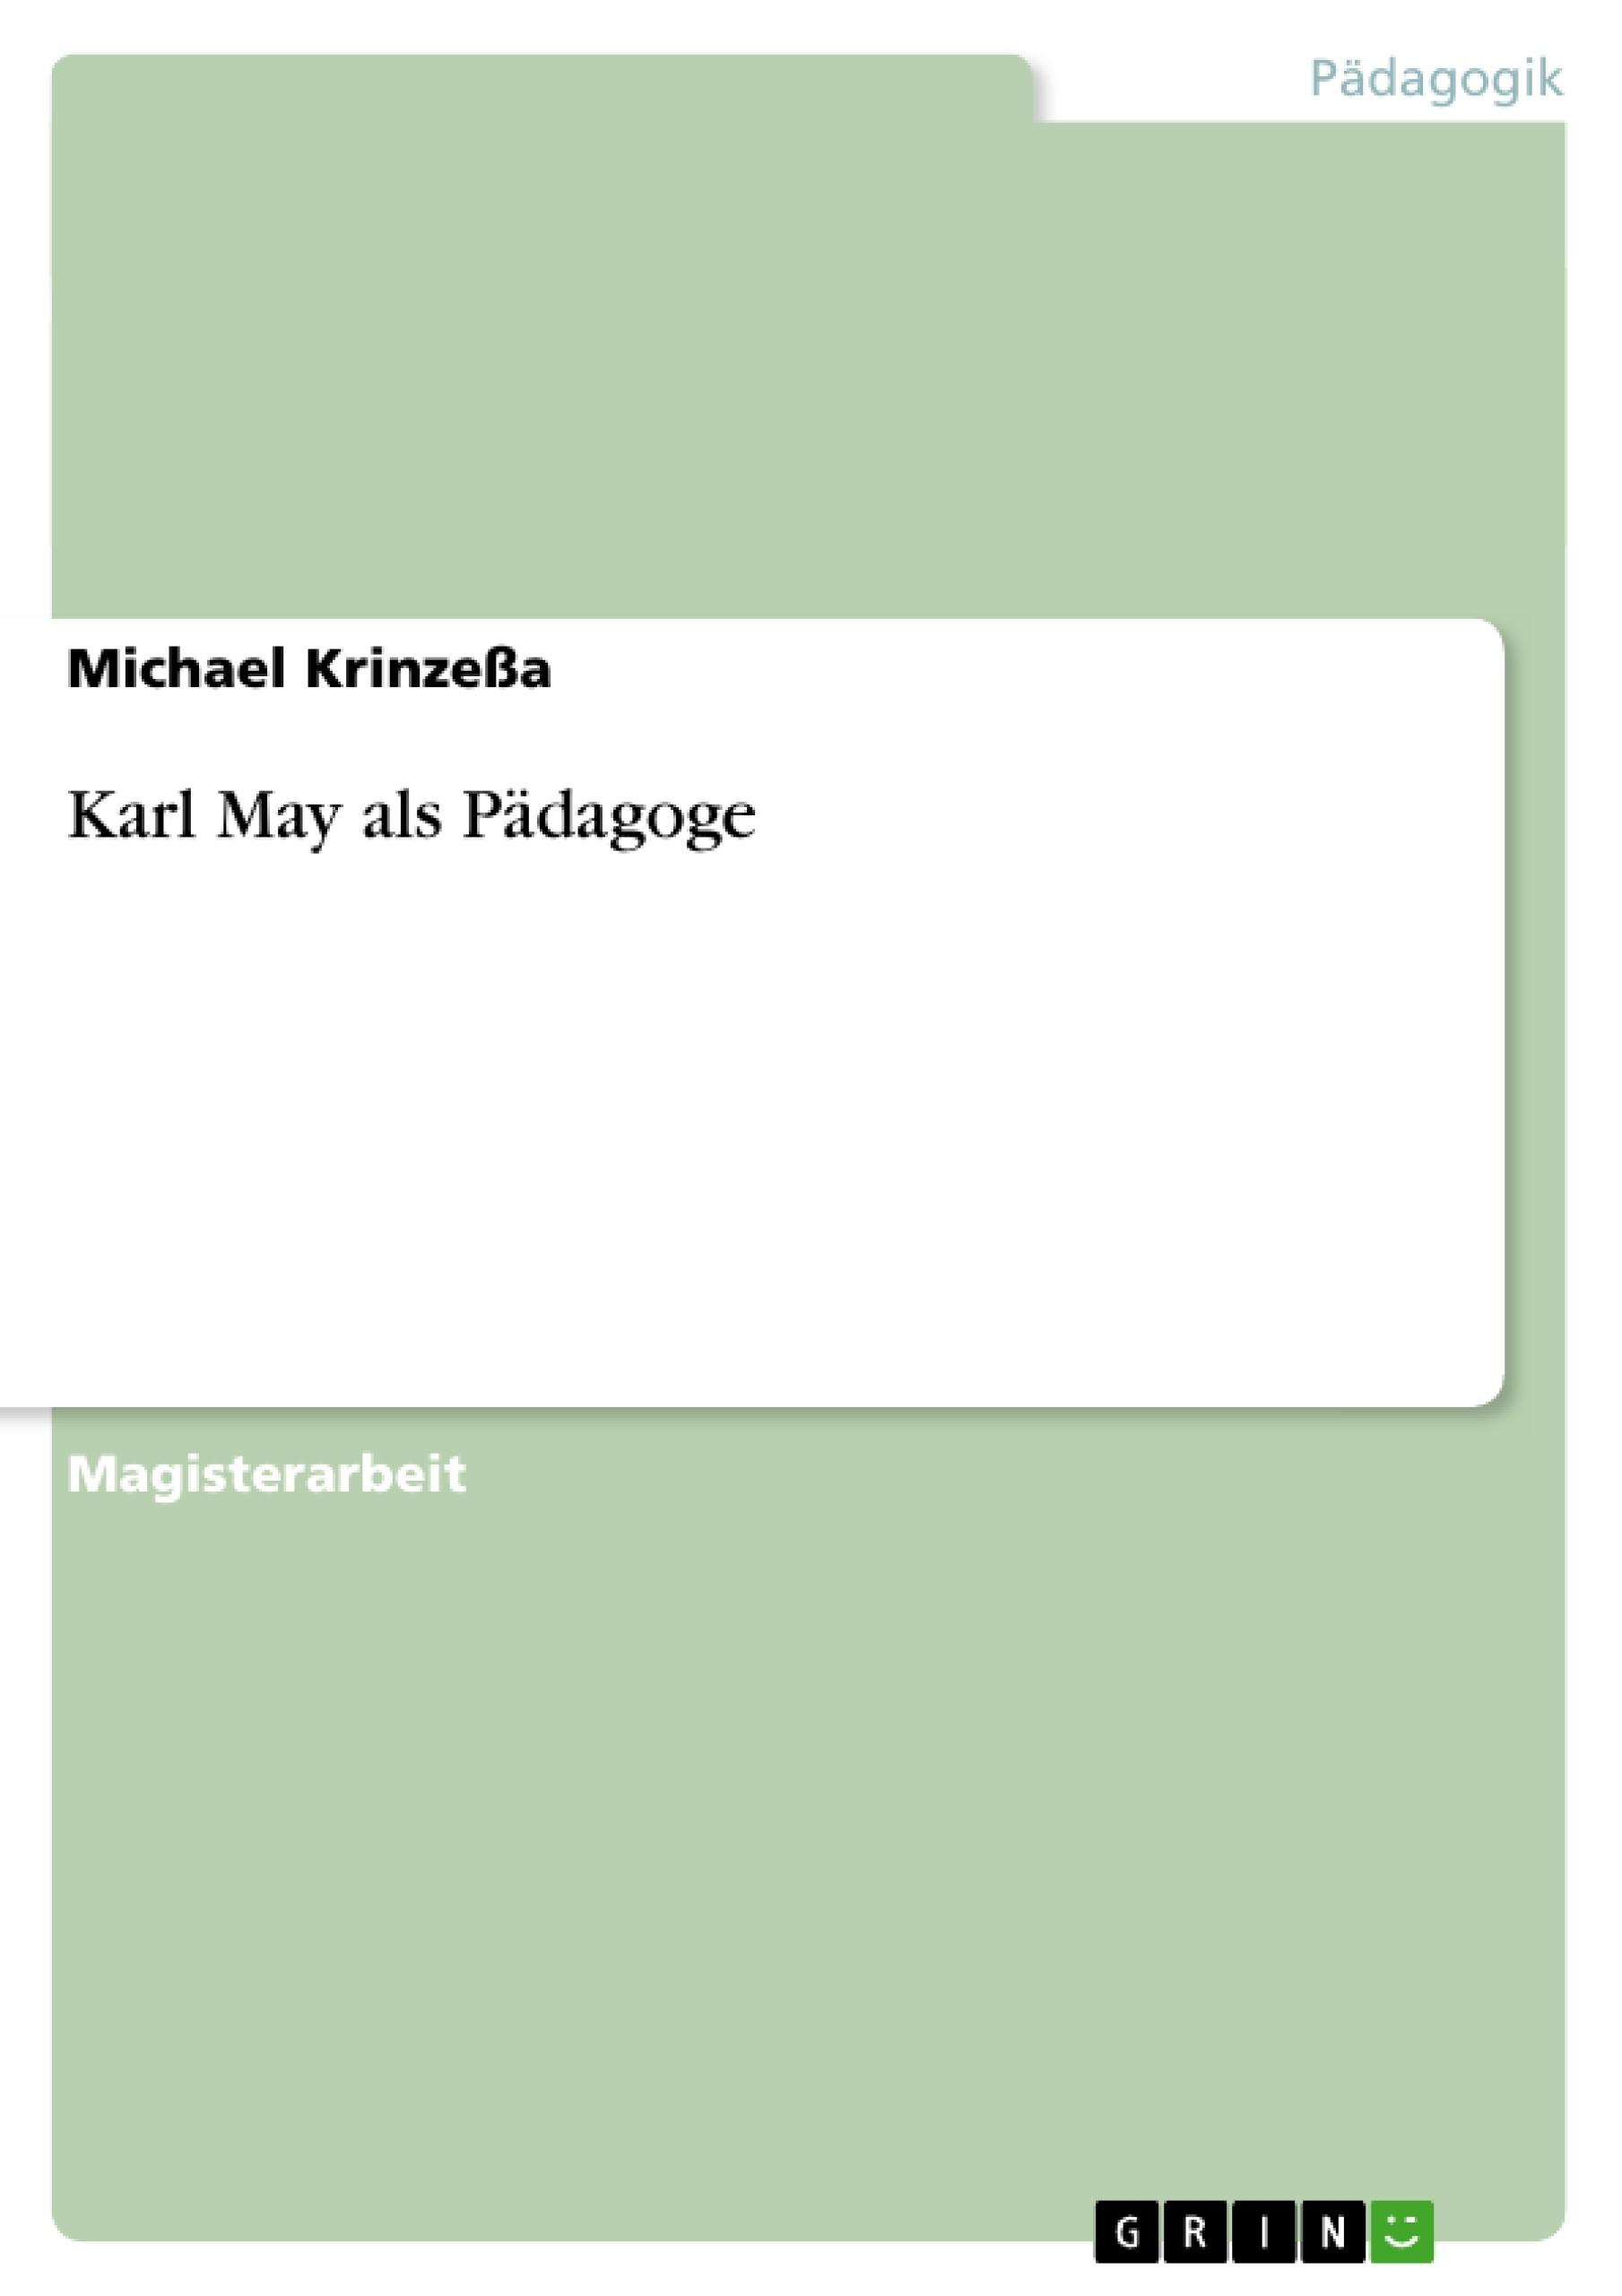 Titel: Karl May als Pädagoge